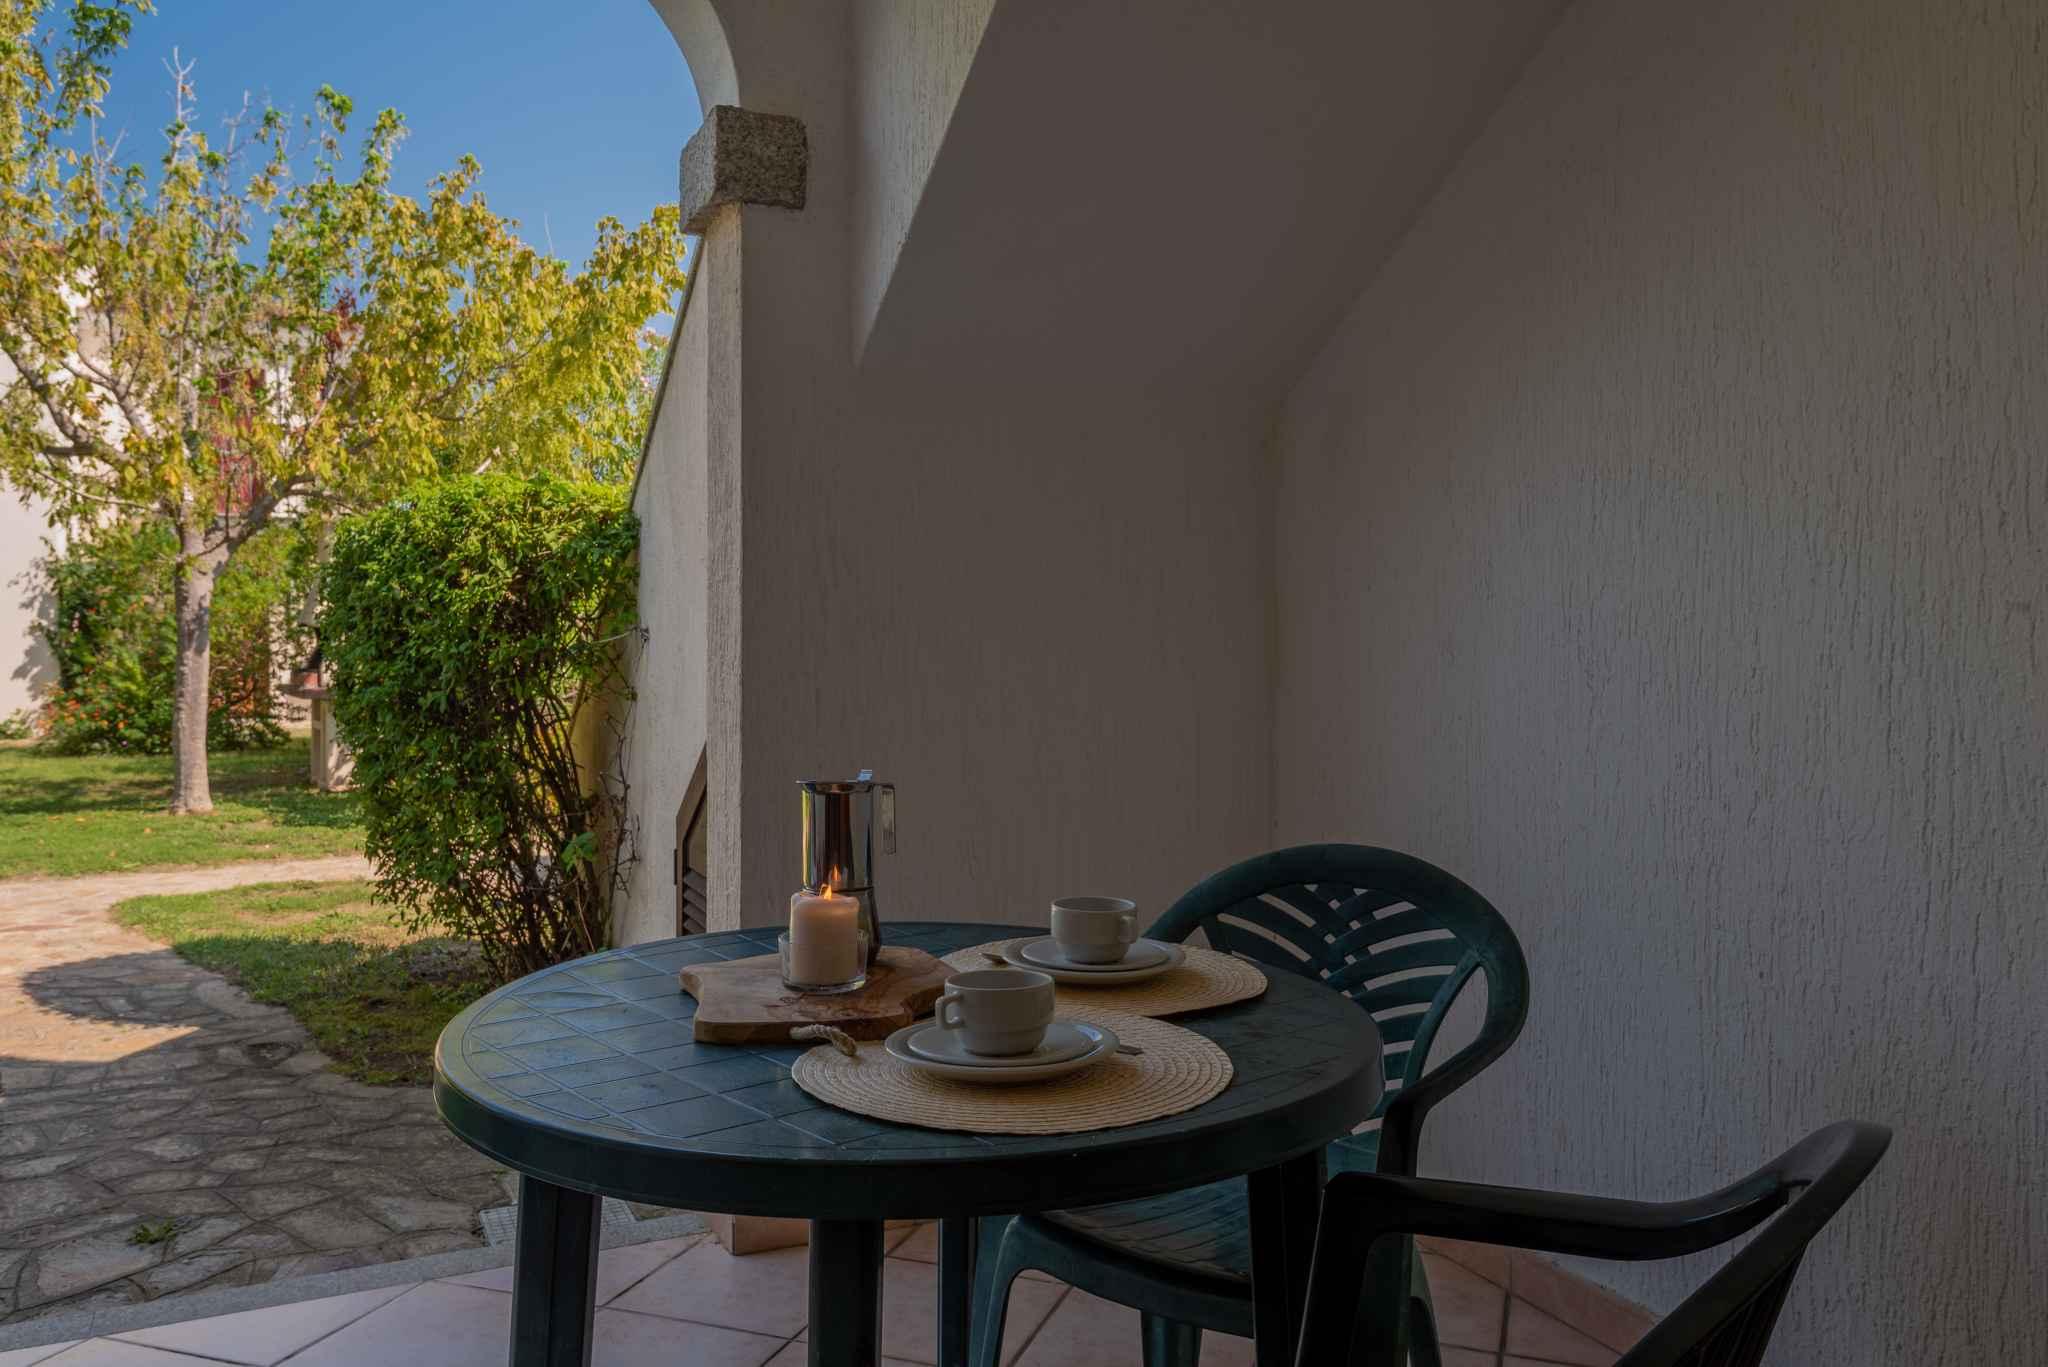 Ferienwohnung Appartamento 2 persone (2853259), Budoni, Olbia-Tempio, Sardinien, Italien, Bild 2